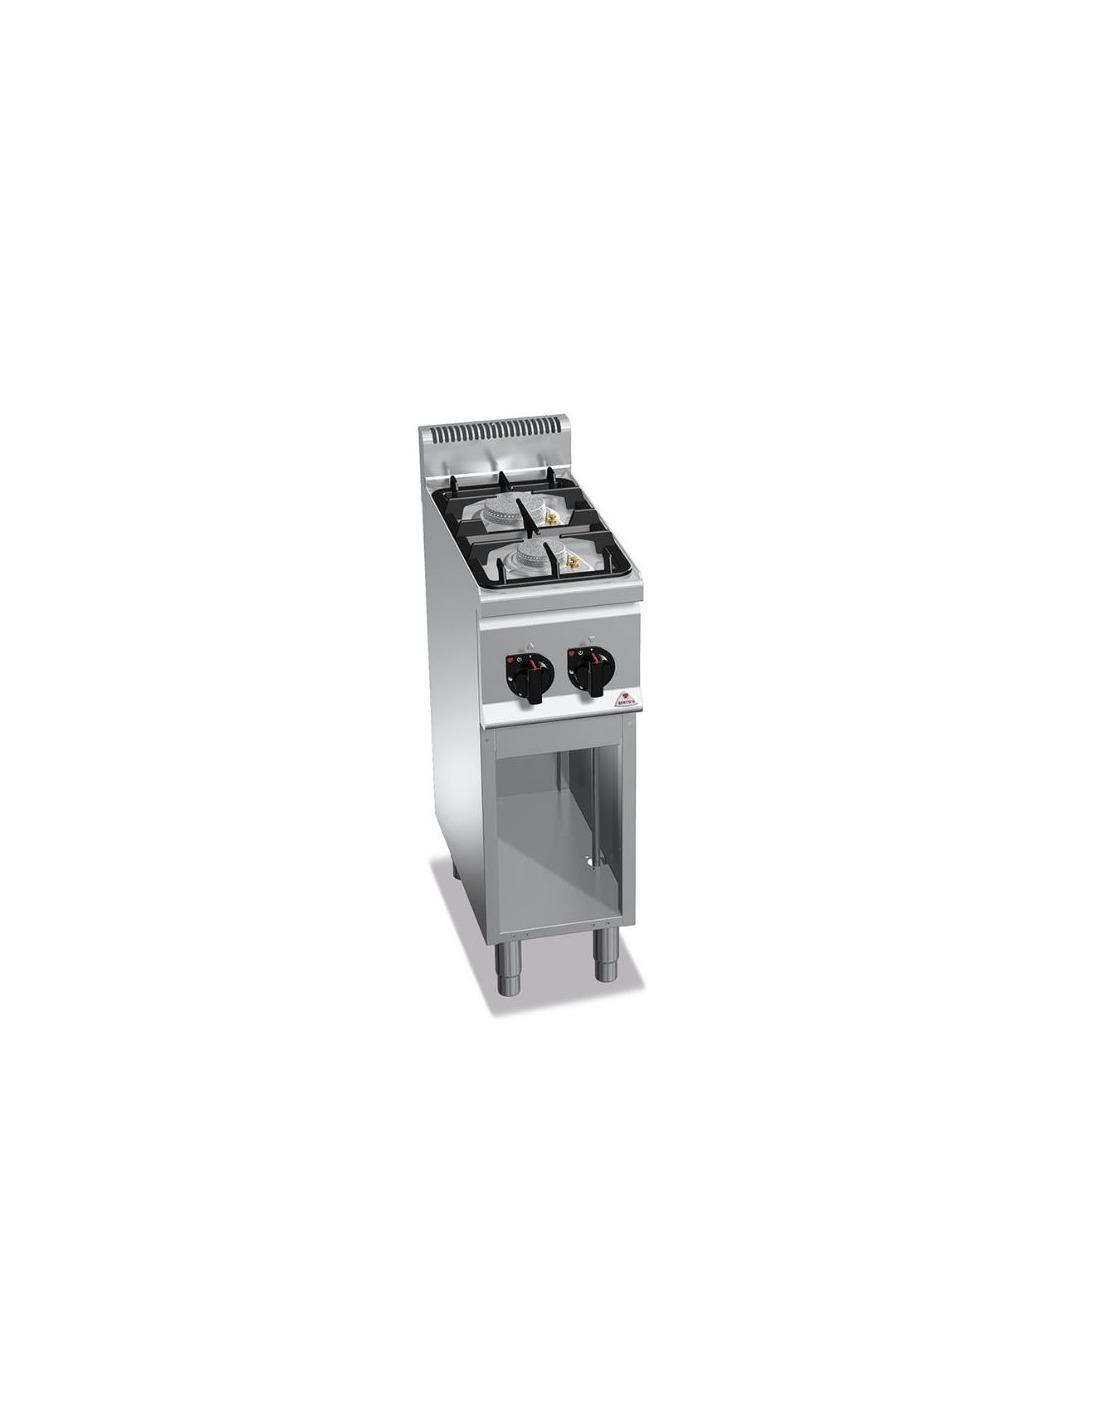 ef70510d8bb cocina industrial a gas 2 quemadores sobre base abierta